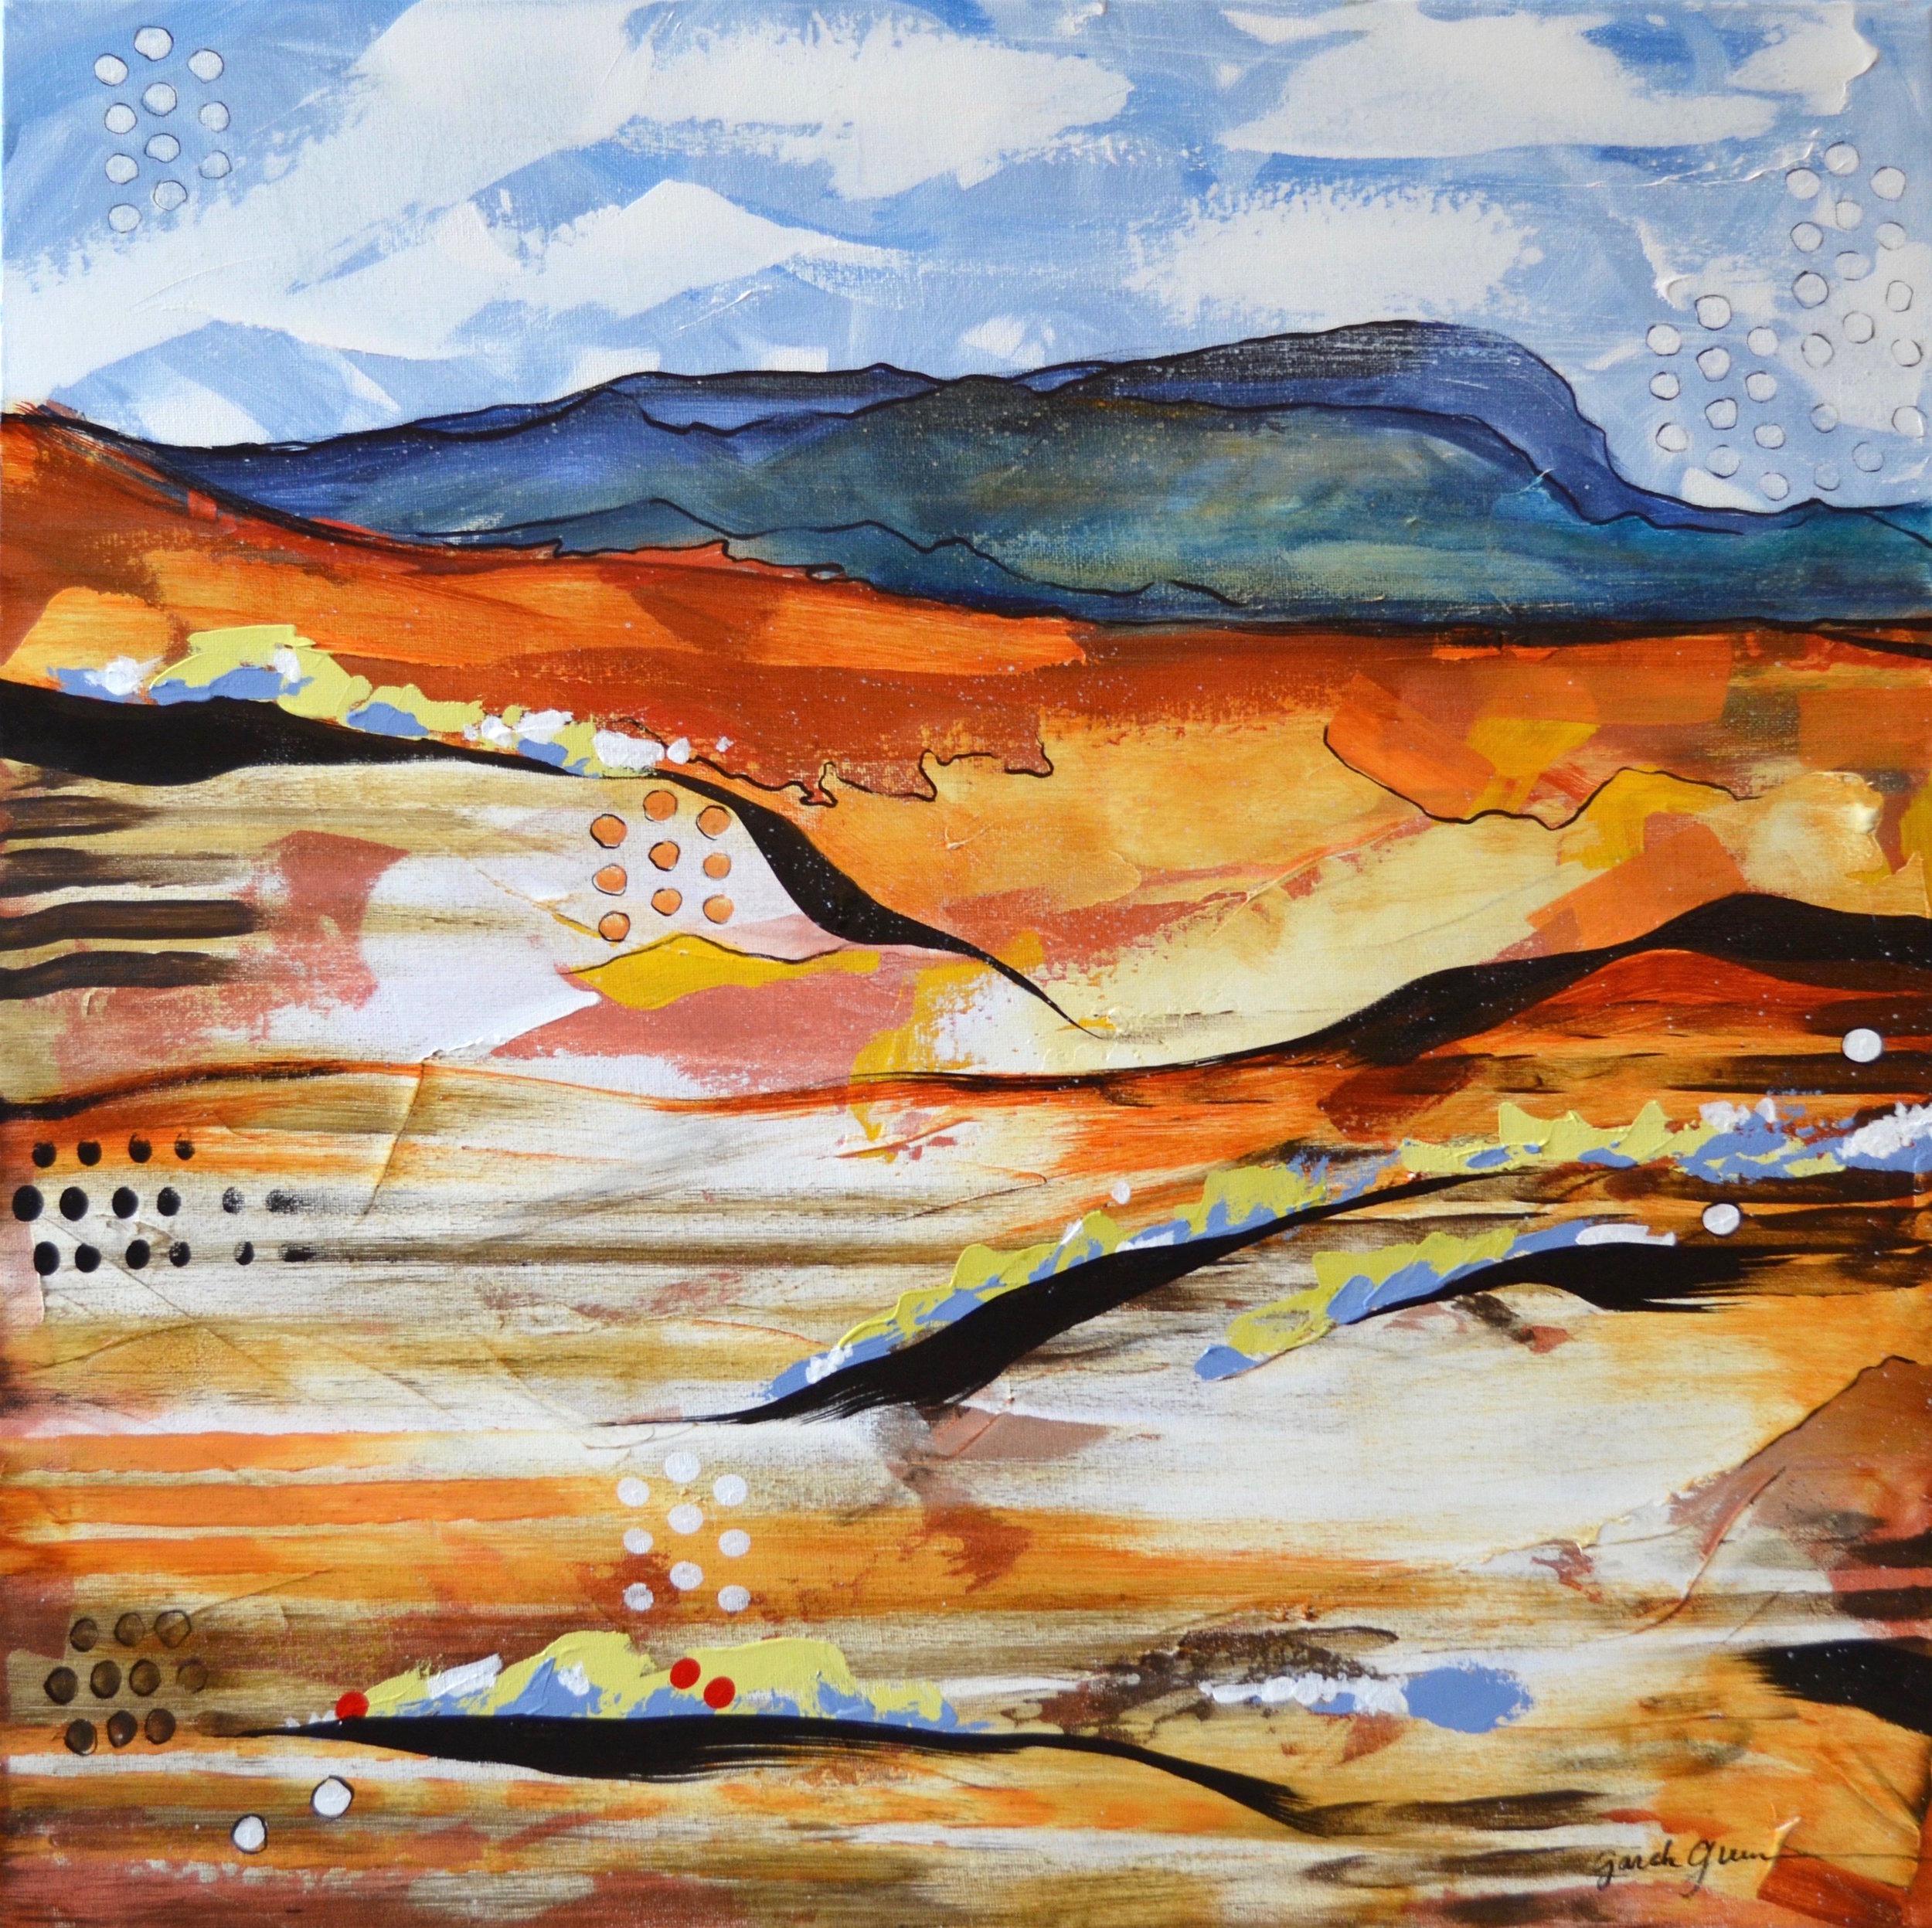 Kingdom of Daylight 1  | 24 x 24 inch acrylic on canvas